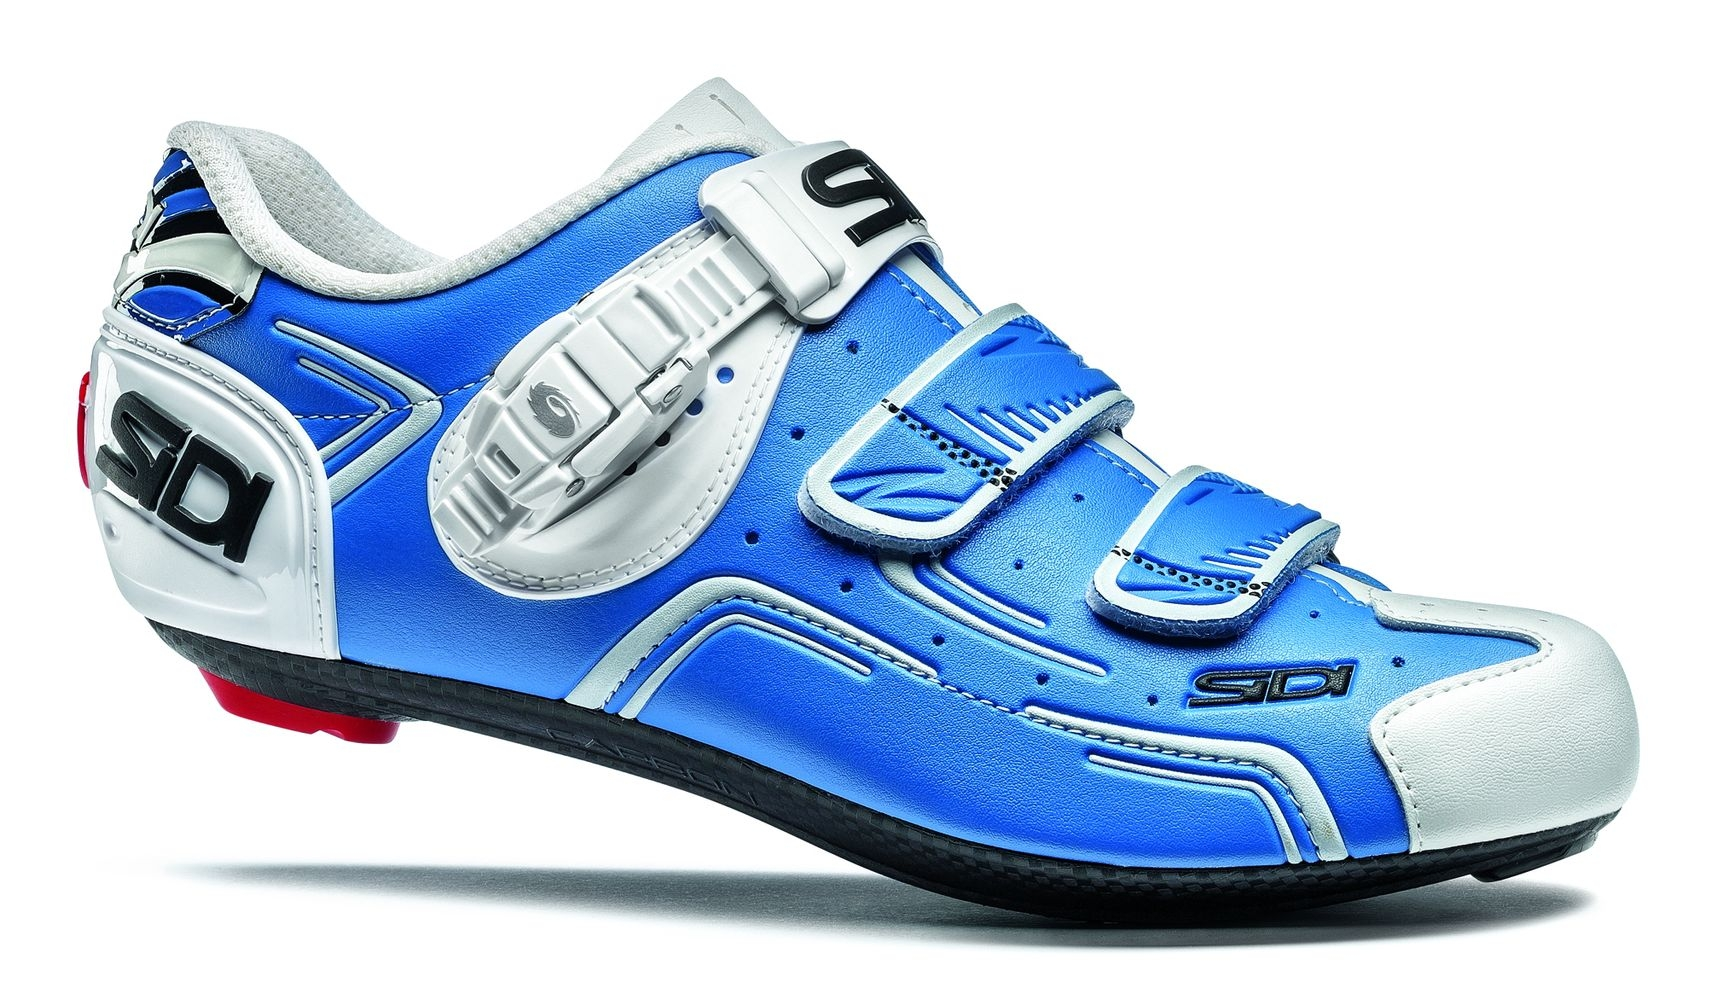 Chaussures Sidi LEVEL Bleu/Blanc - 43